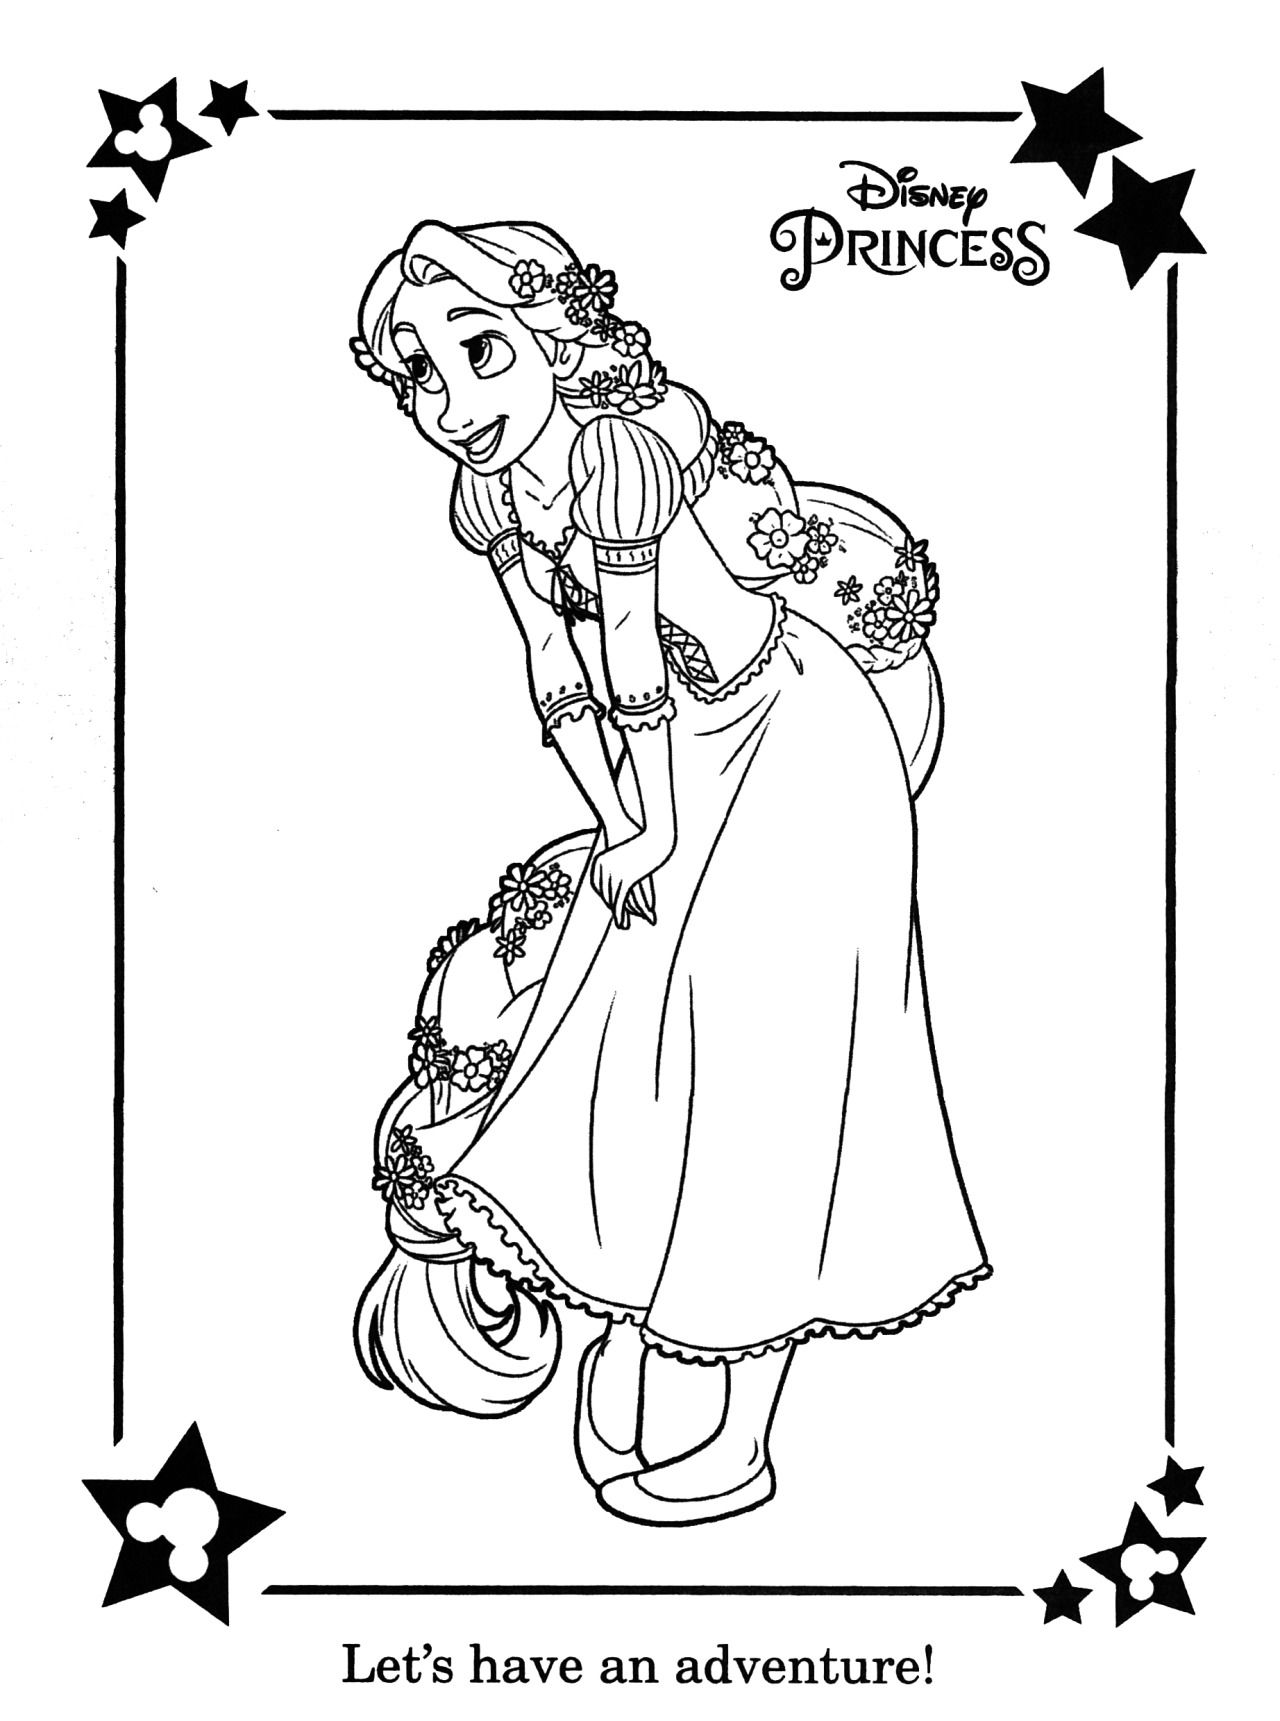 Ausmalbilder Rapunzel Maximus : Runningracingdancingchasing 2 3 I Picked Up A New Coloring Book